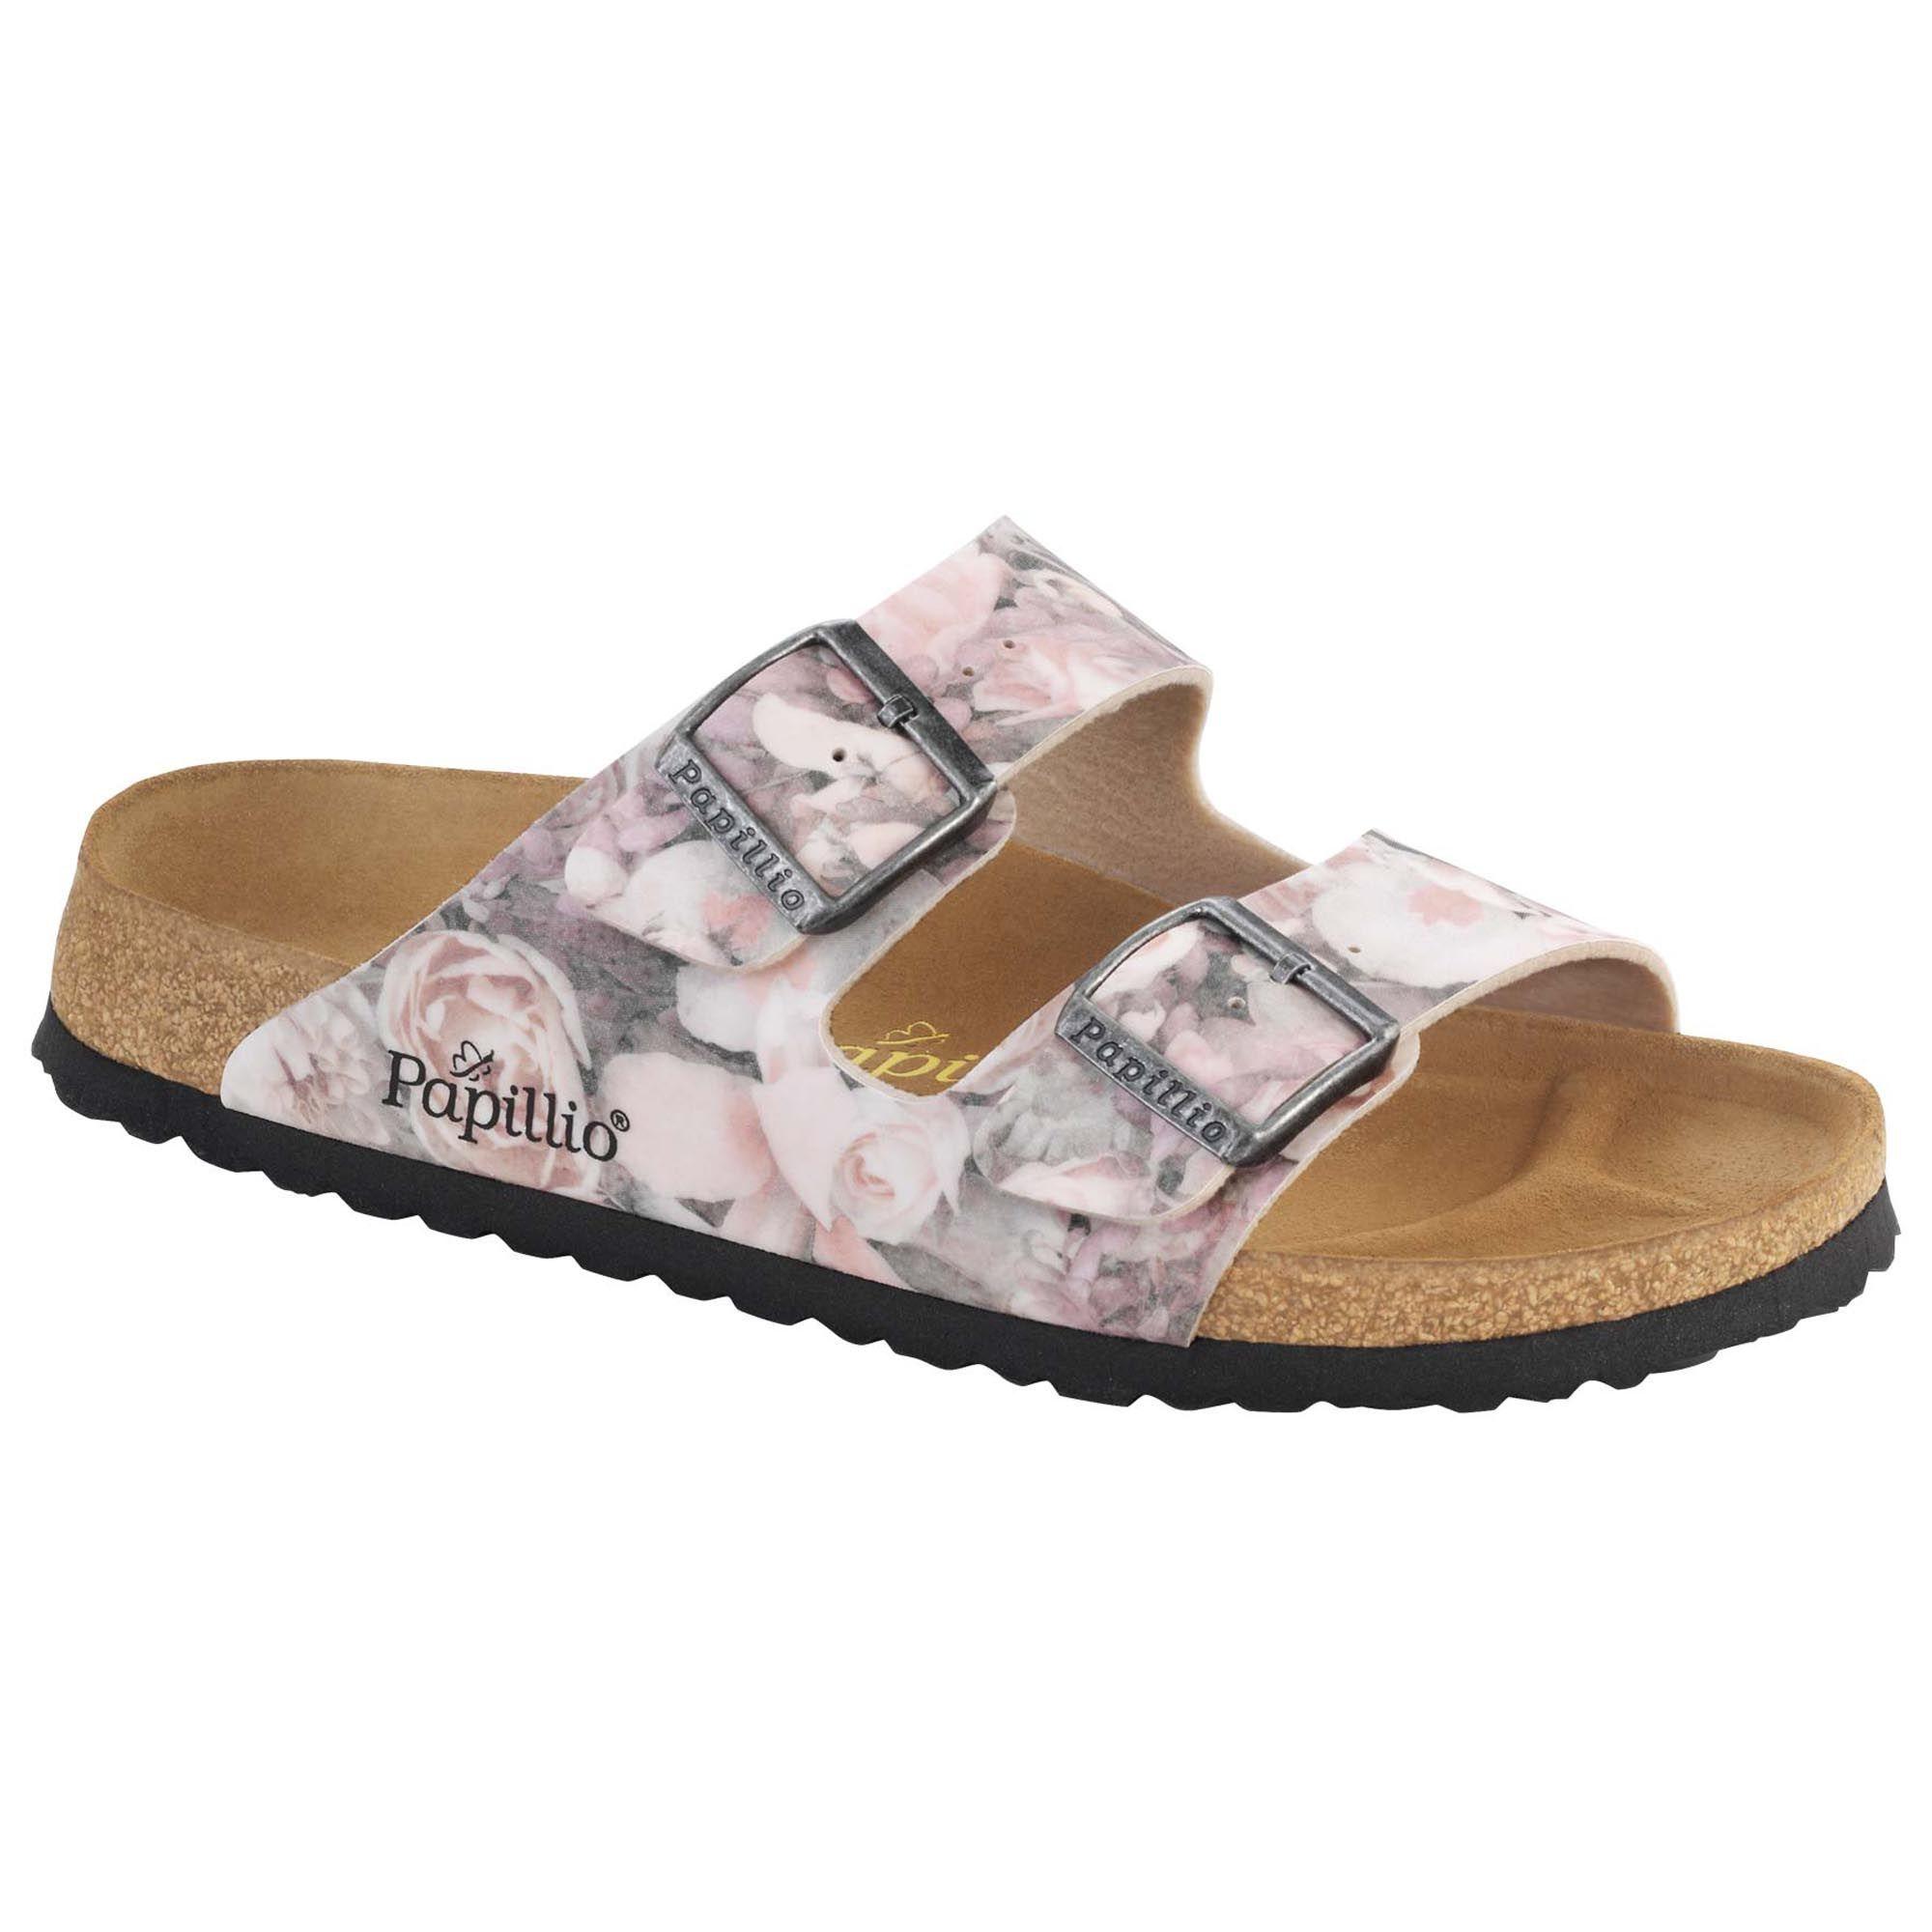 ARIZONA Sandalette Damen, Pink Rosa, Größe 40